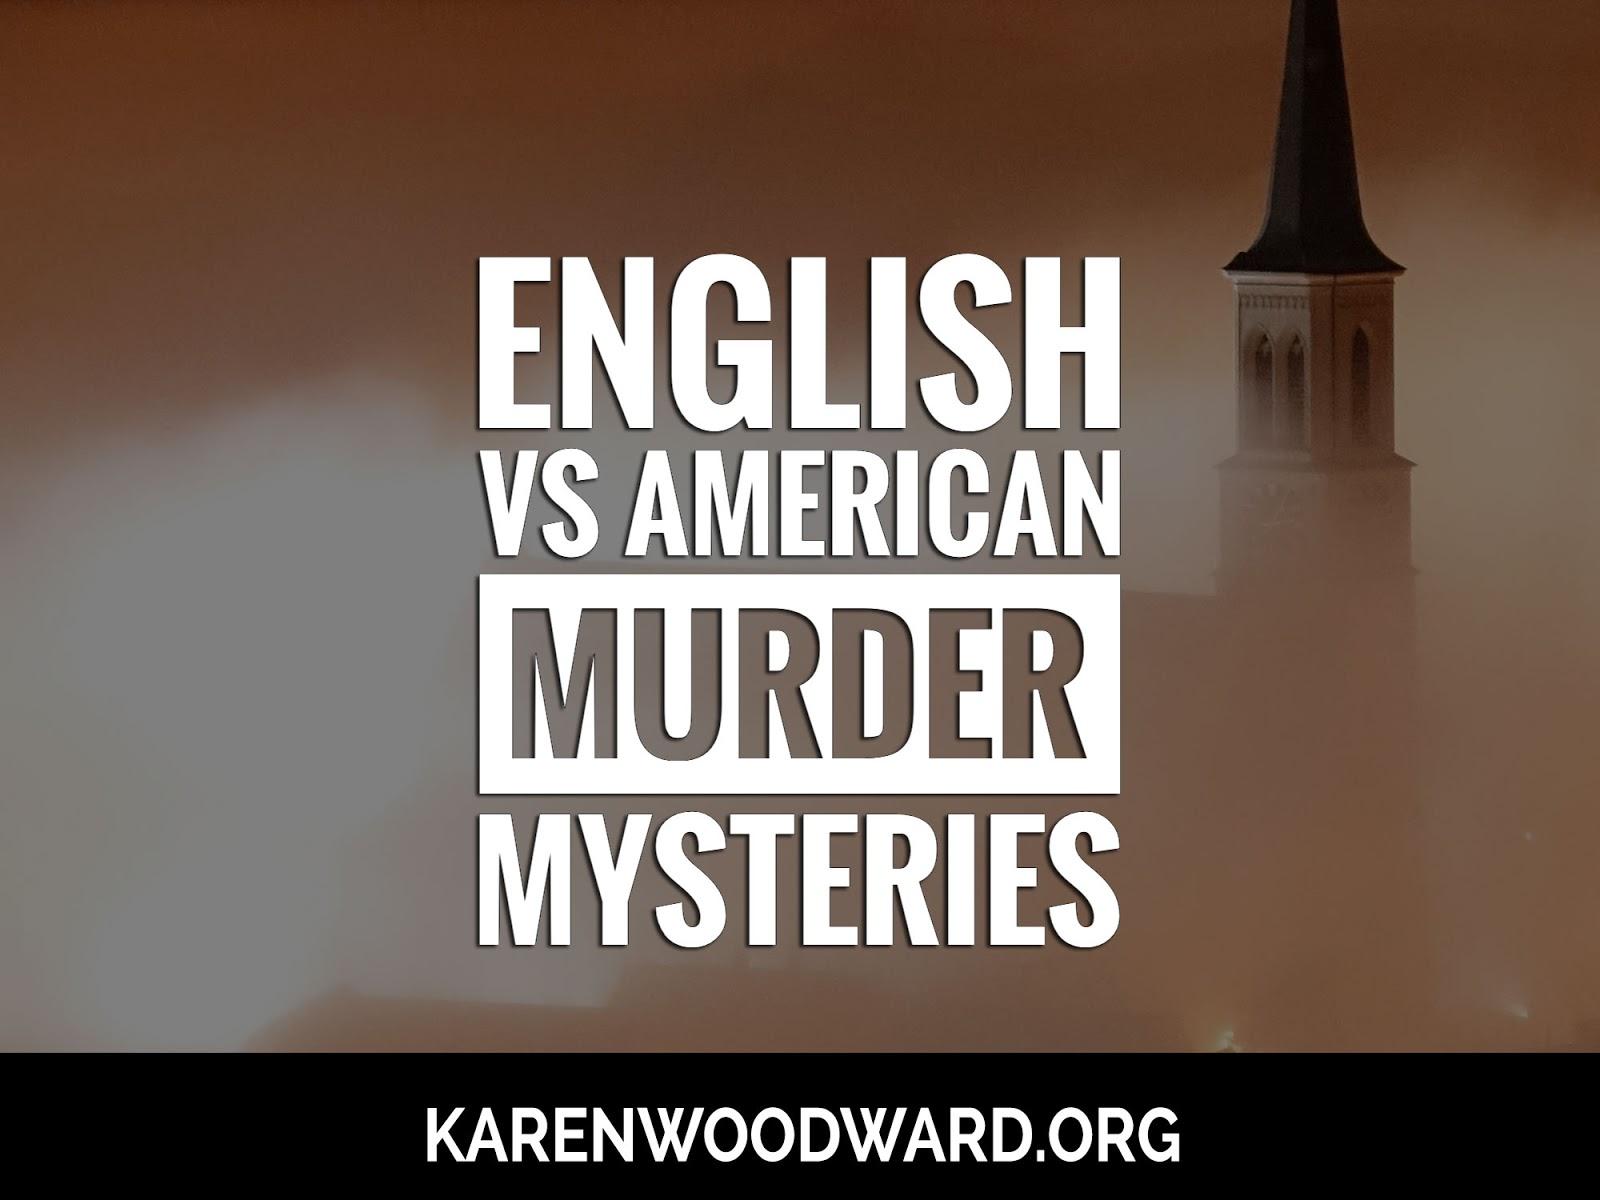 Karen Woodward: English vs American Murder Mysteries